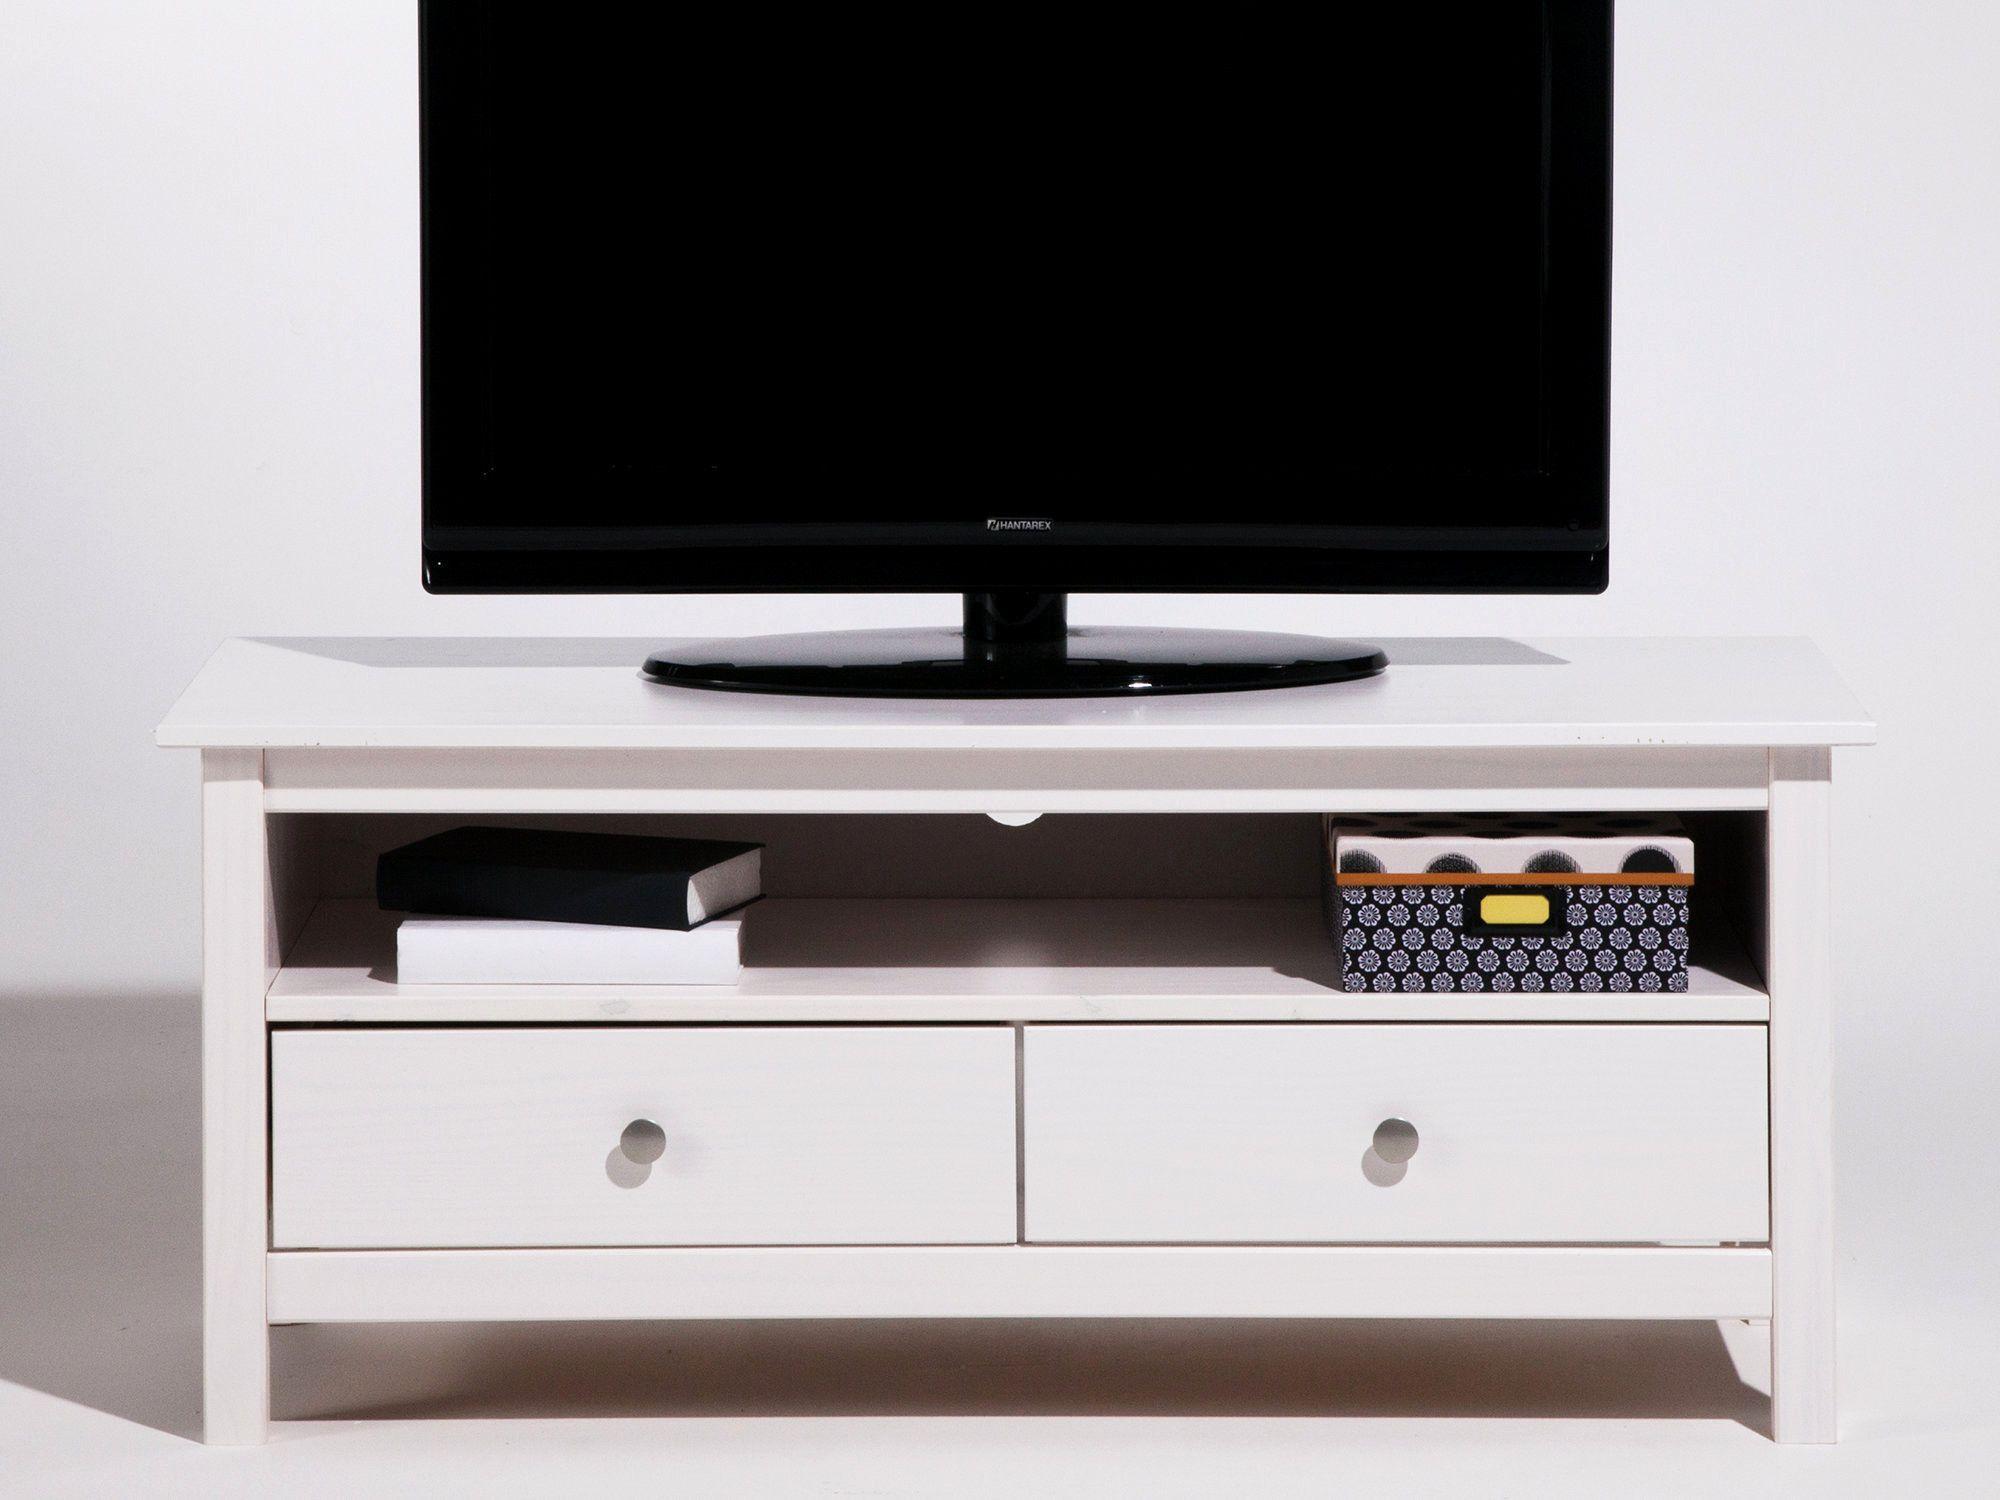 Luxe Boconcept Meuble Tv Idees Bo Concept Meuble Bas Bo Concept Meuble Entree Bo Concept Meuble Tv Fabriquer Meuble Tv Mobilier De Salon Meuble Tv Palette